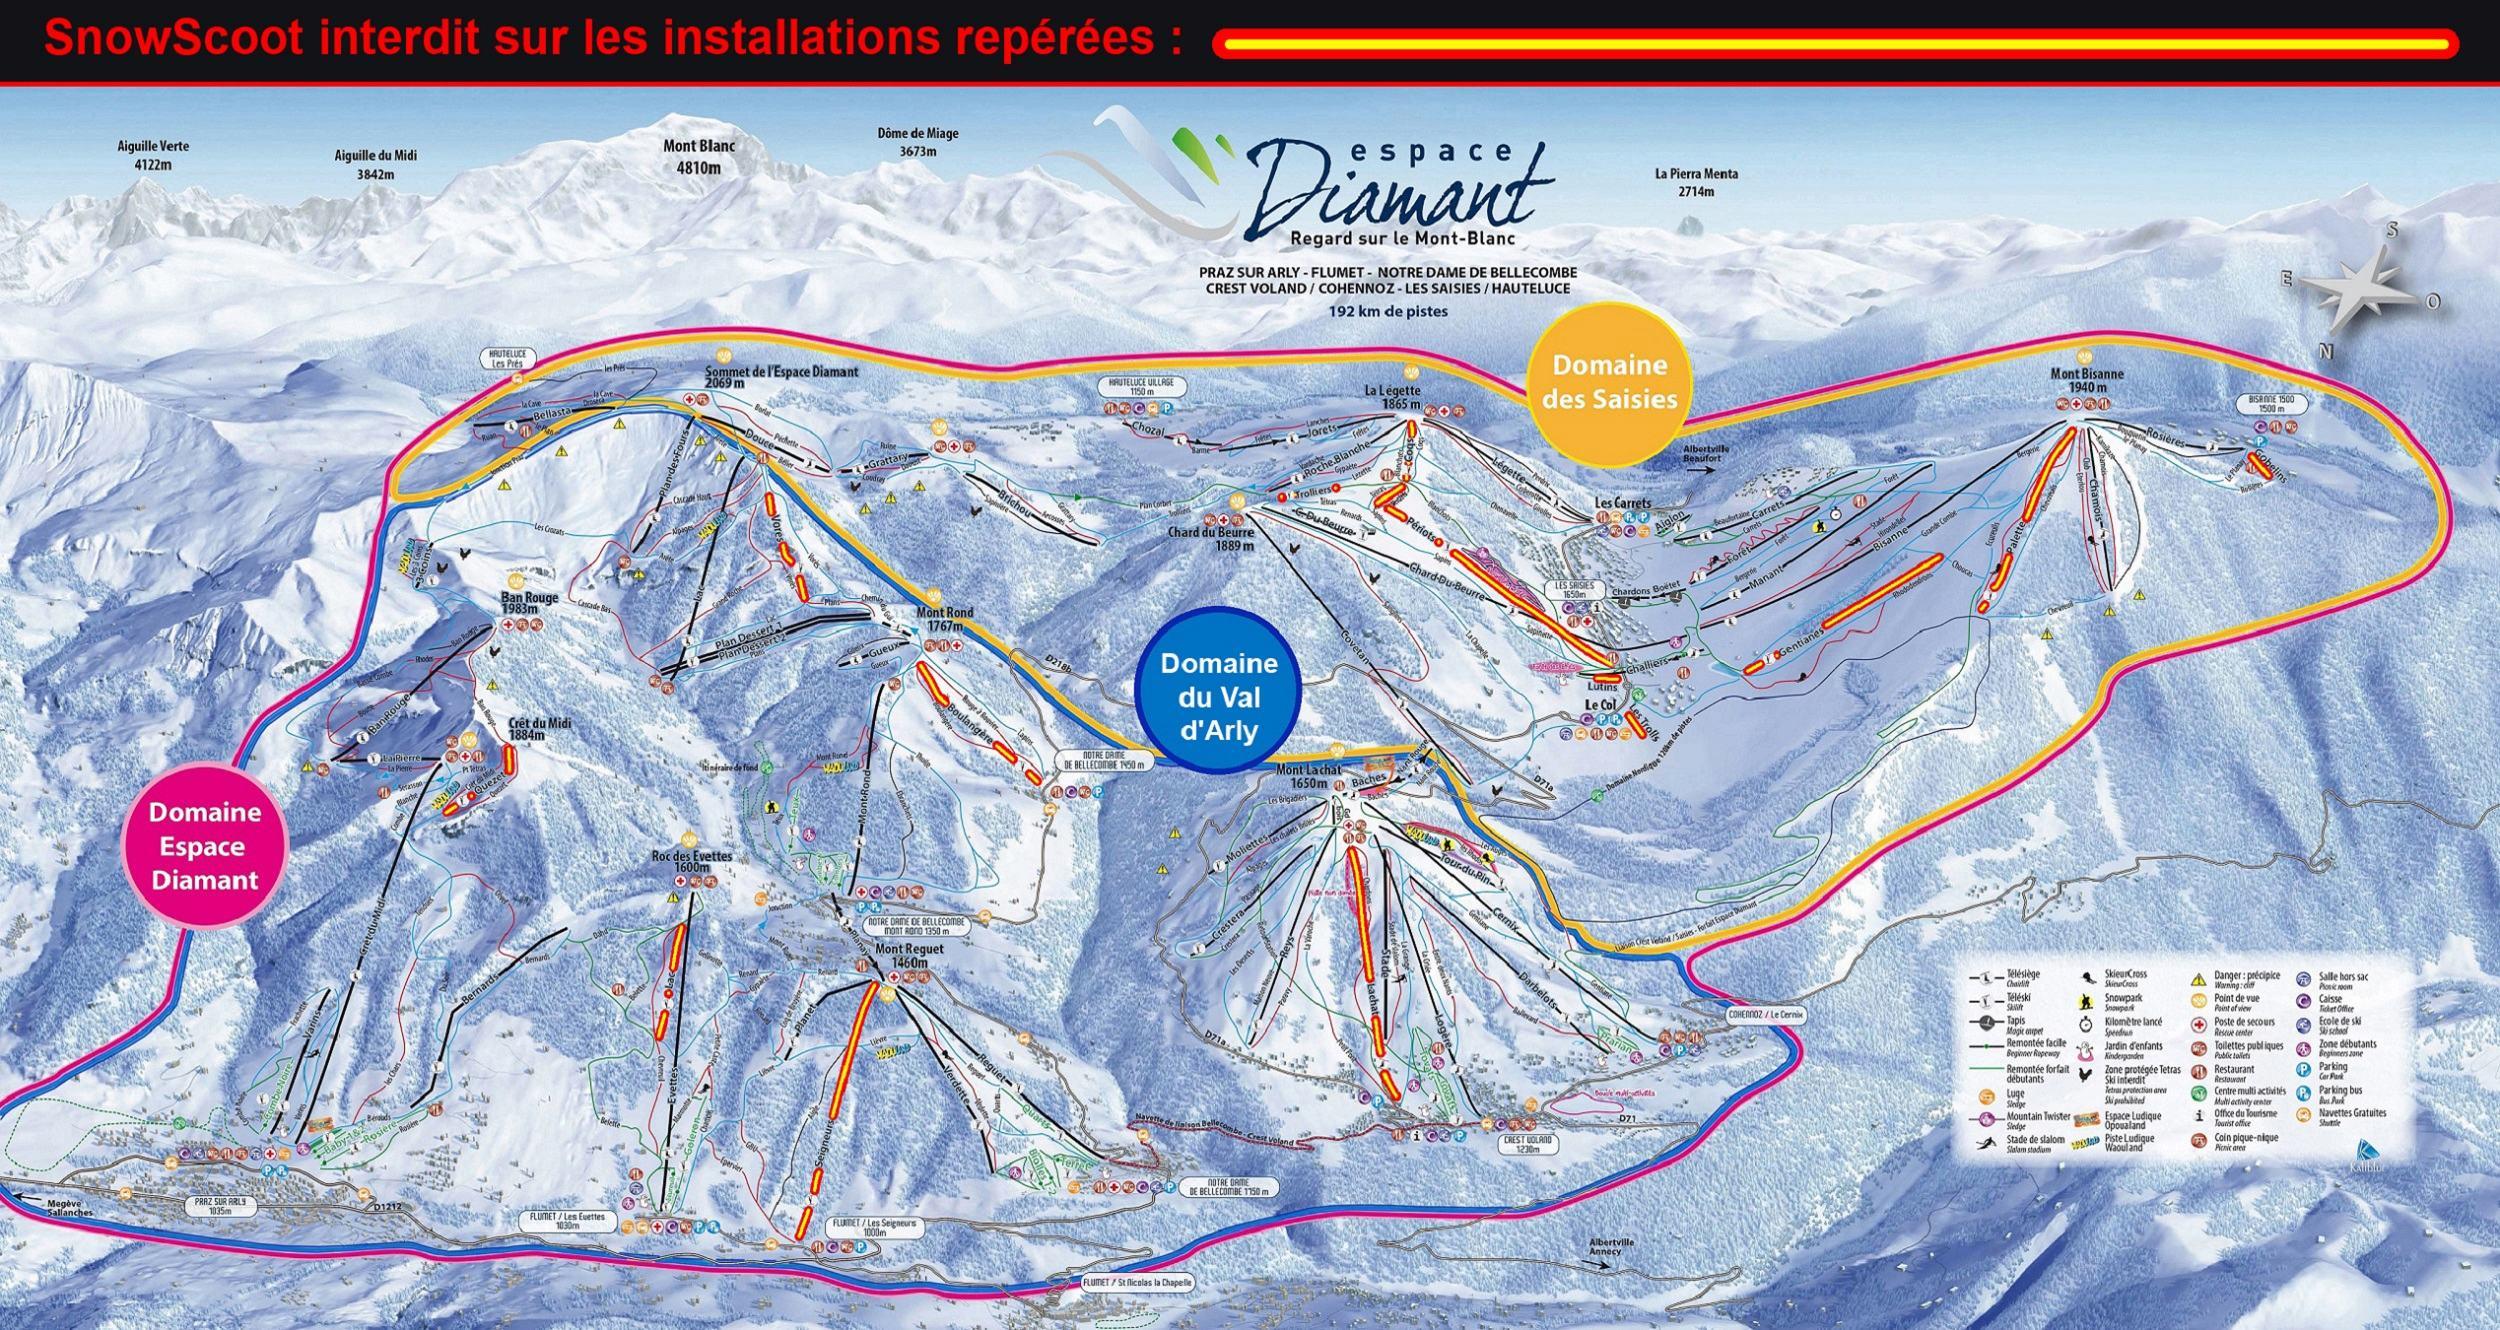 73 - Espace Diamant - Val d'Arly. Snows_15